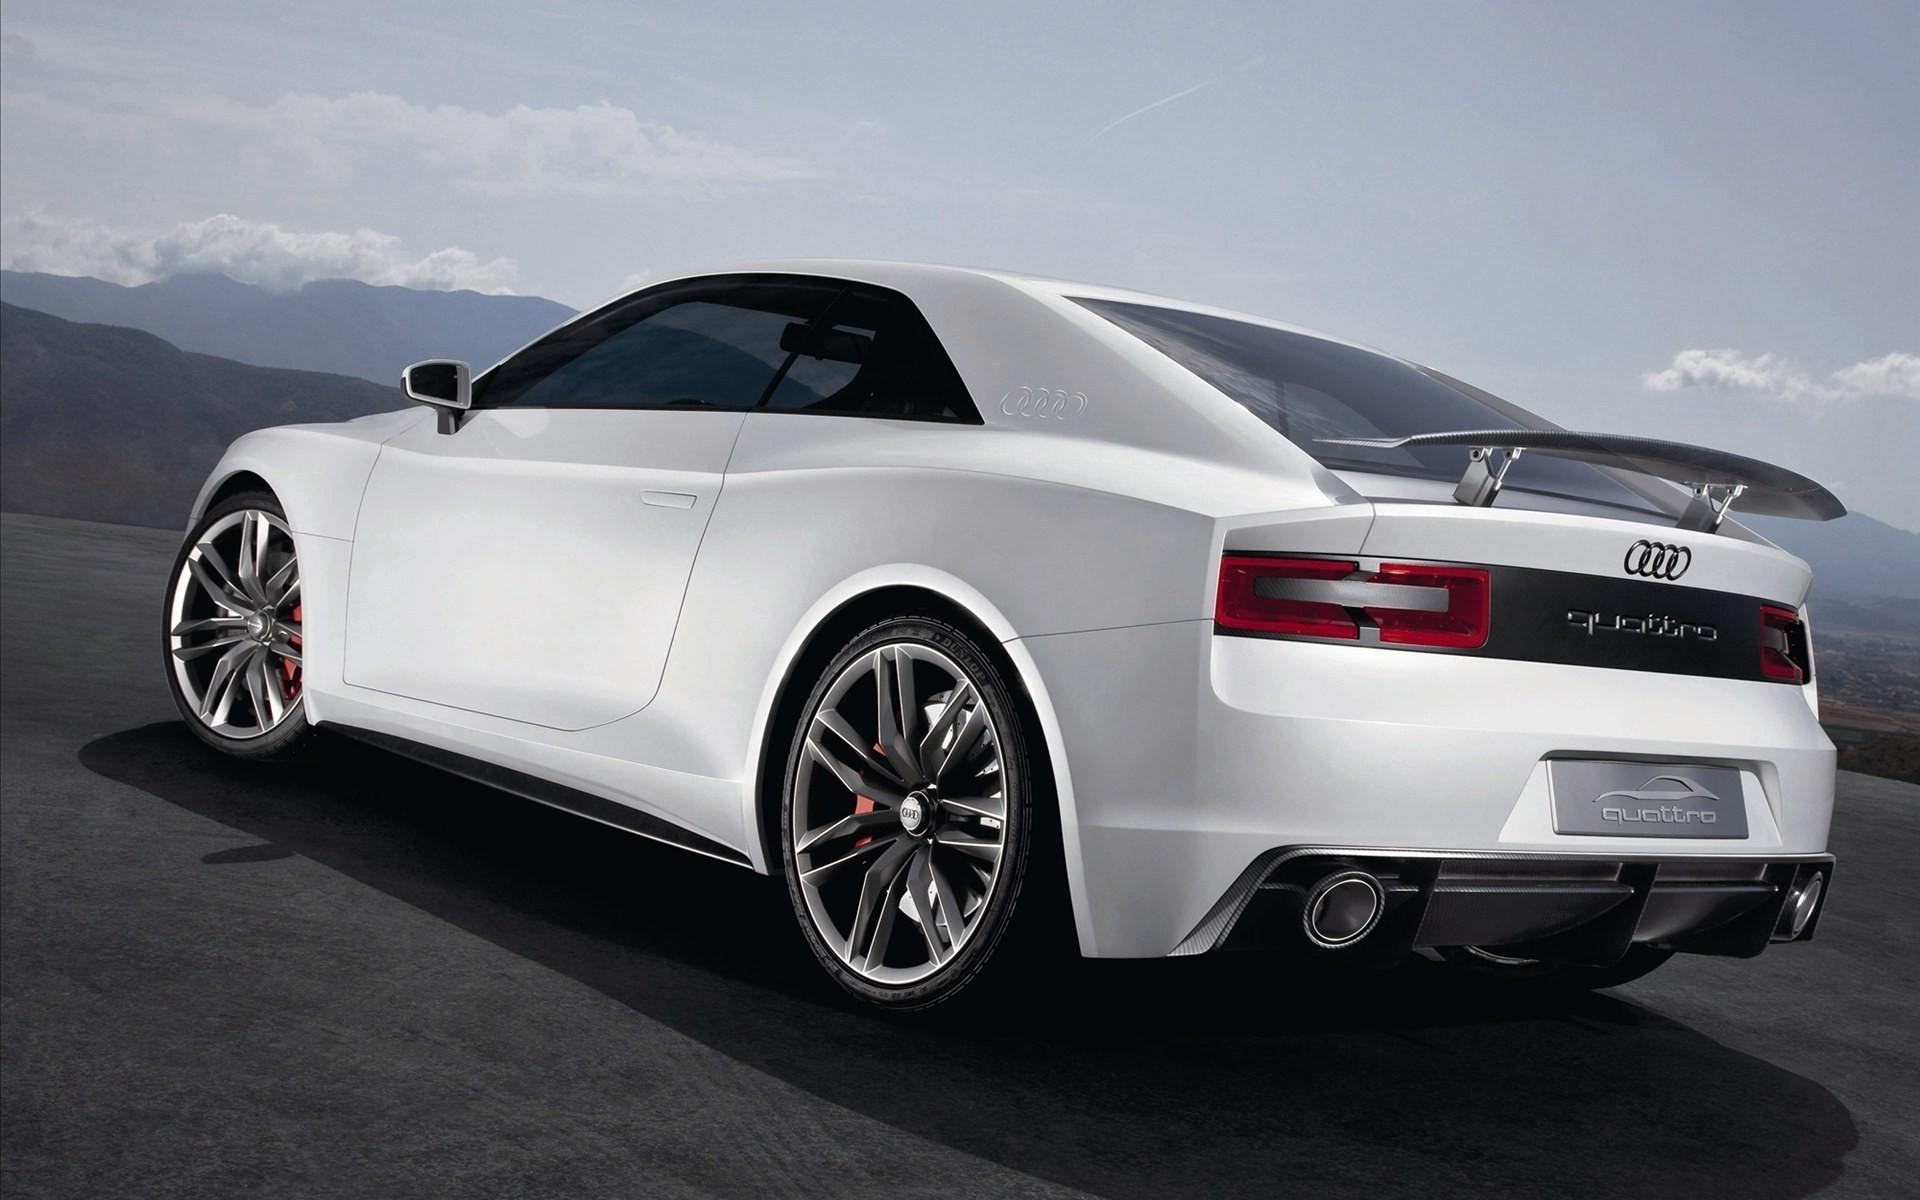 Cars Concept Art Vehicles Concept Cars Audi Quattro